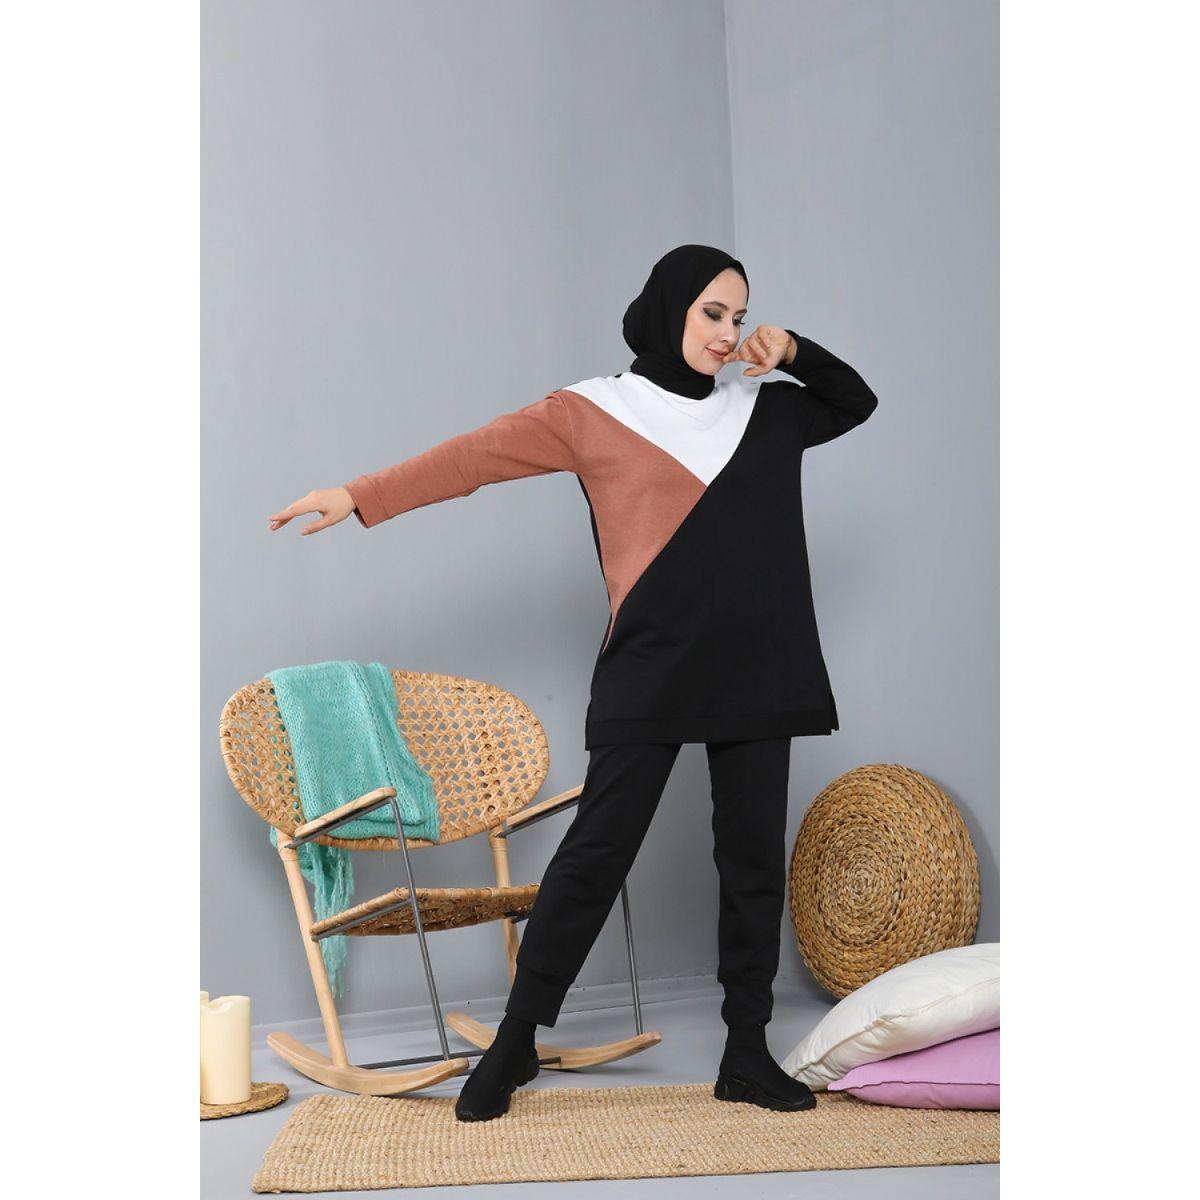 Sports Double Muslim Set Muslim Fashion Double Hijab Suit Young Muslim Fashion Muslim Women Sport Clothing 2021 Fashion